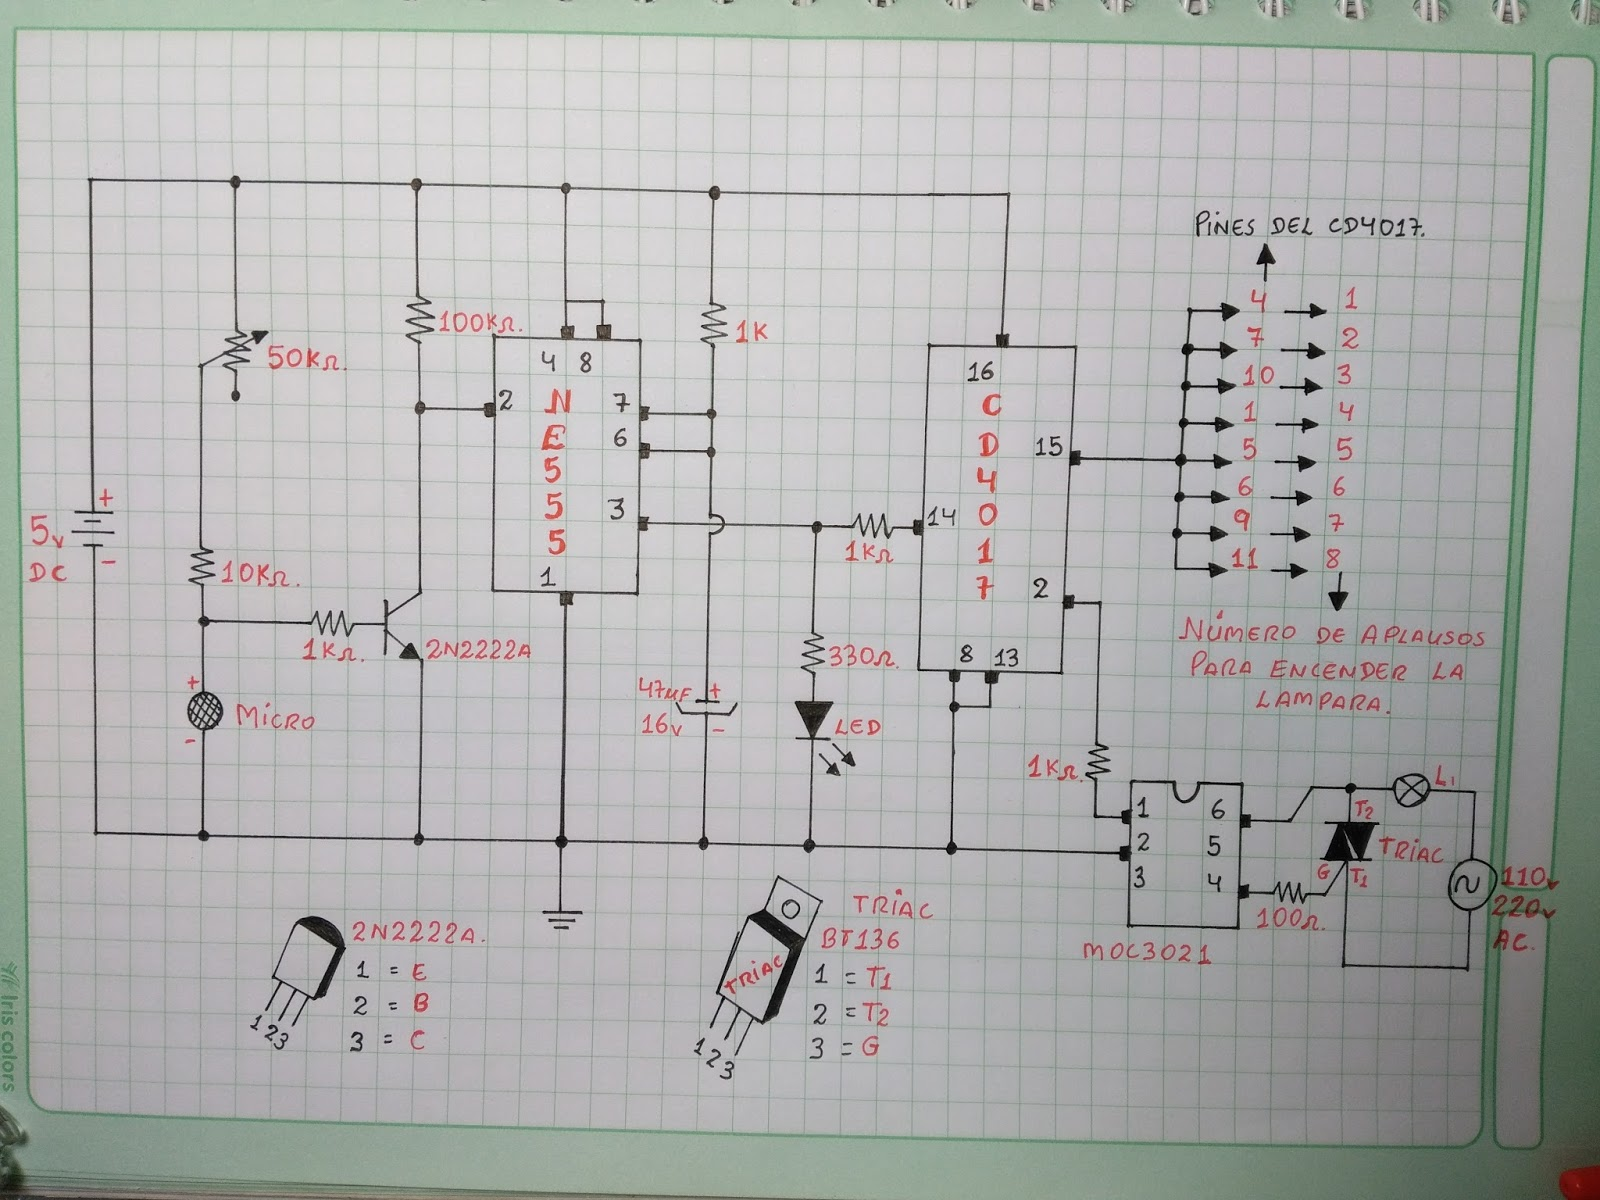 Circuito Electrico Simple Diagrama : Circuito interruptor con aplausos programable desde hasta